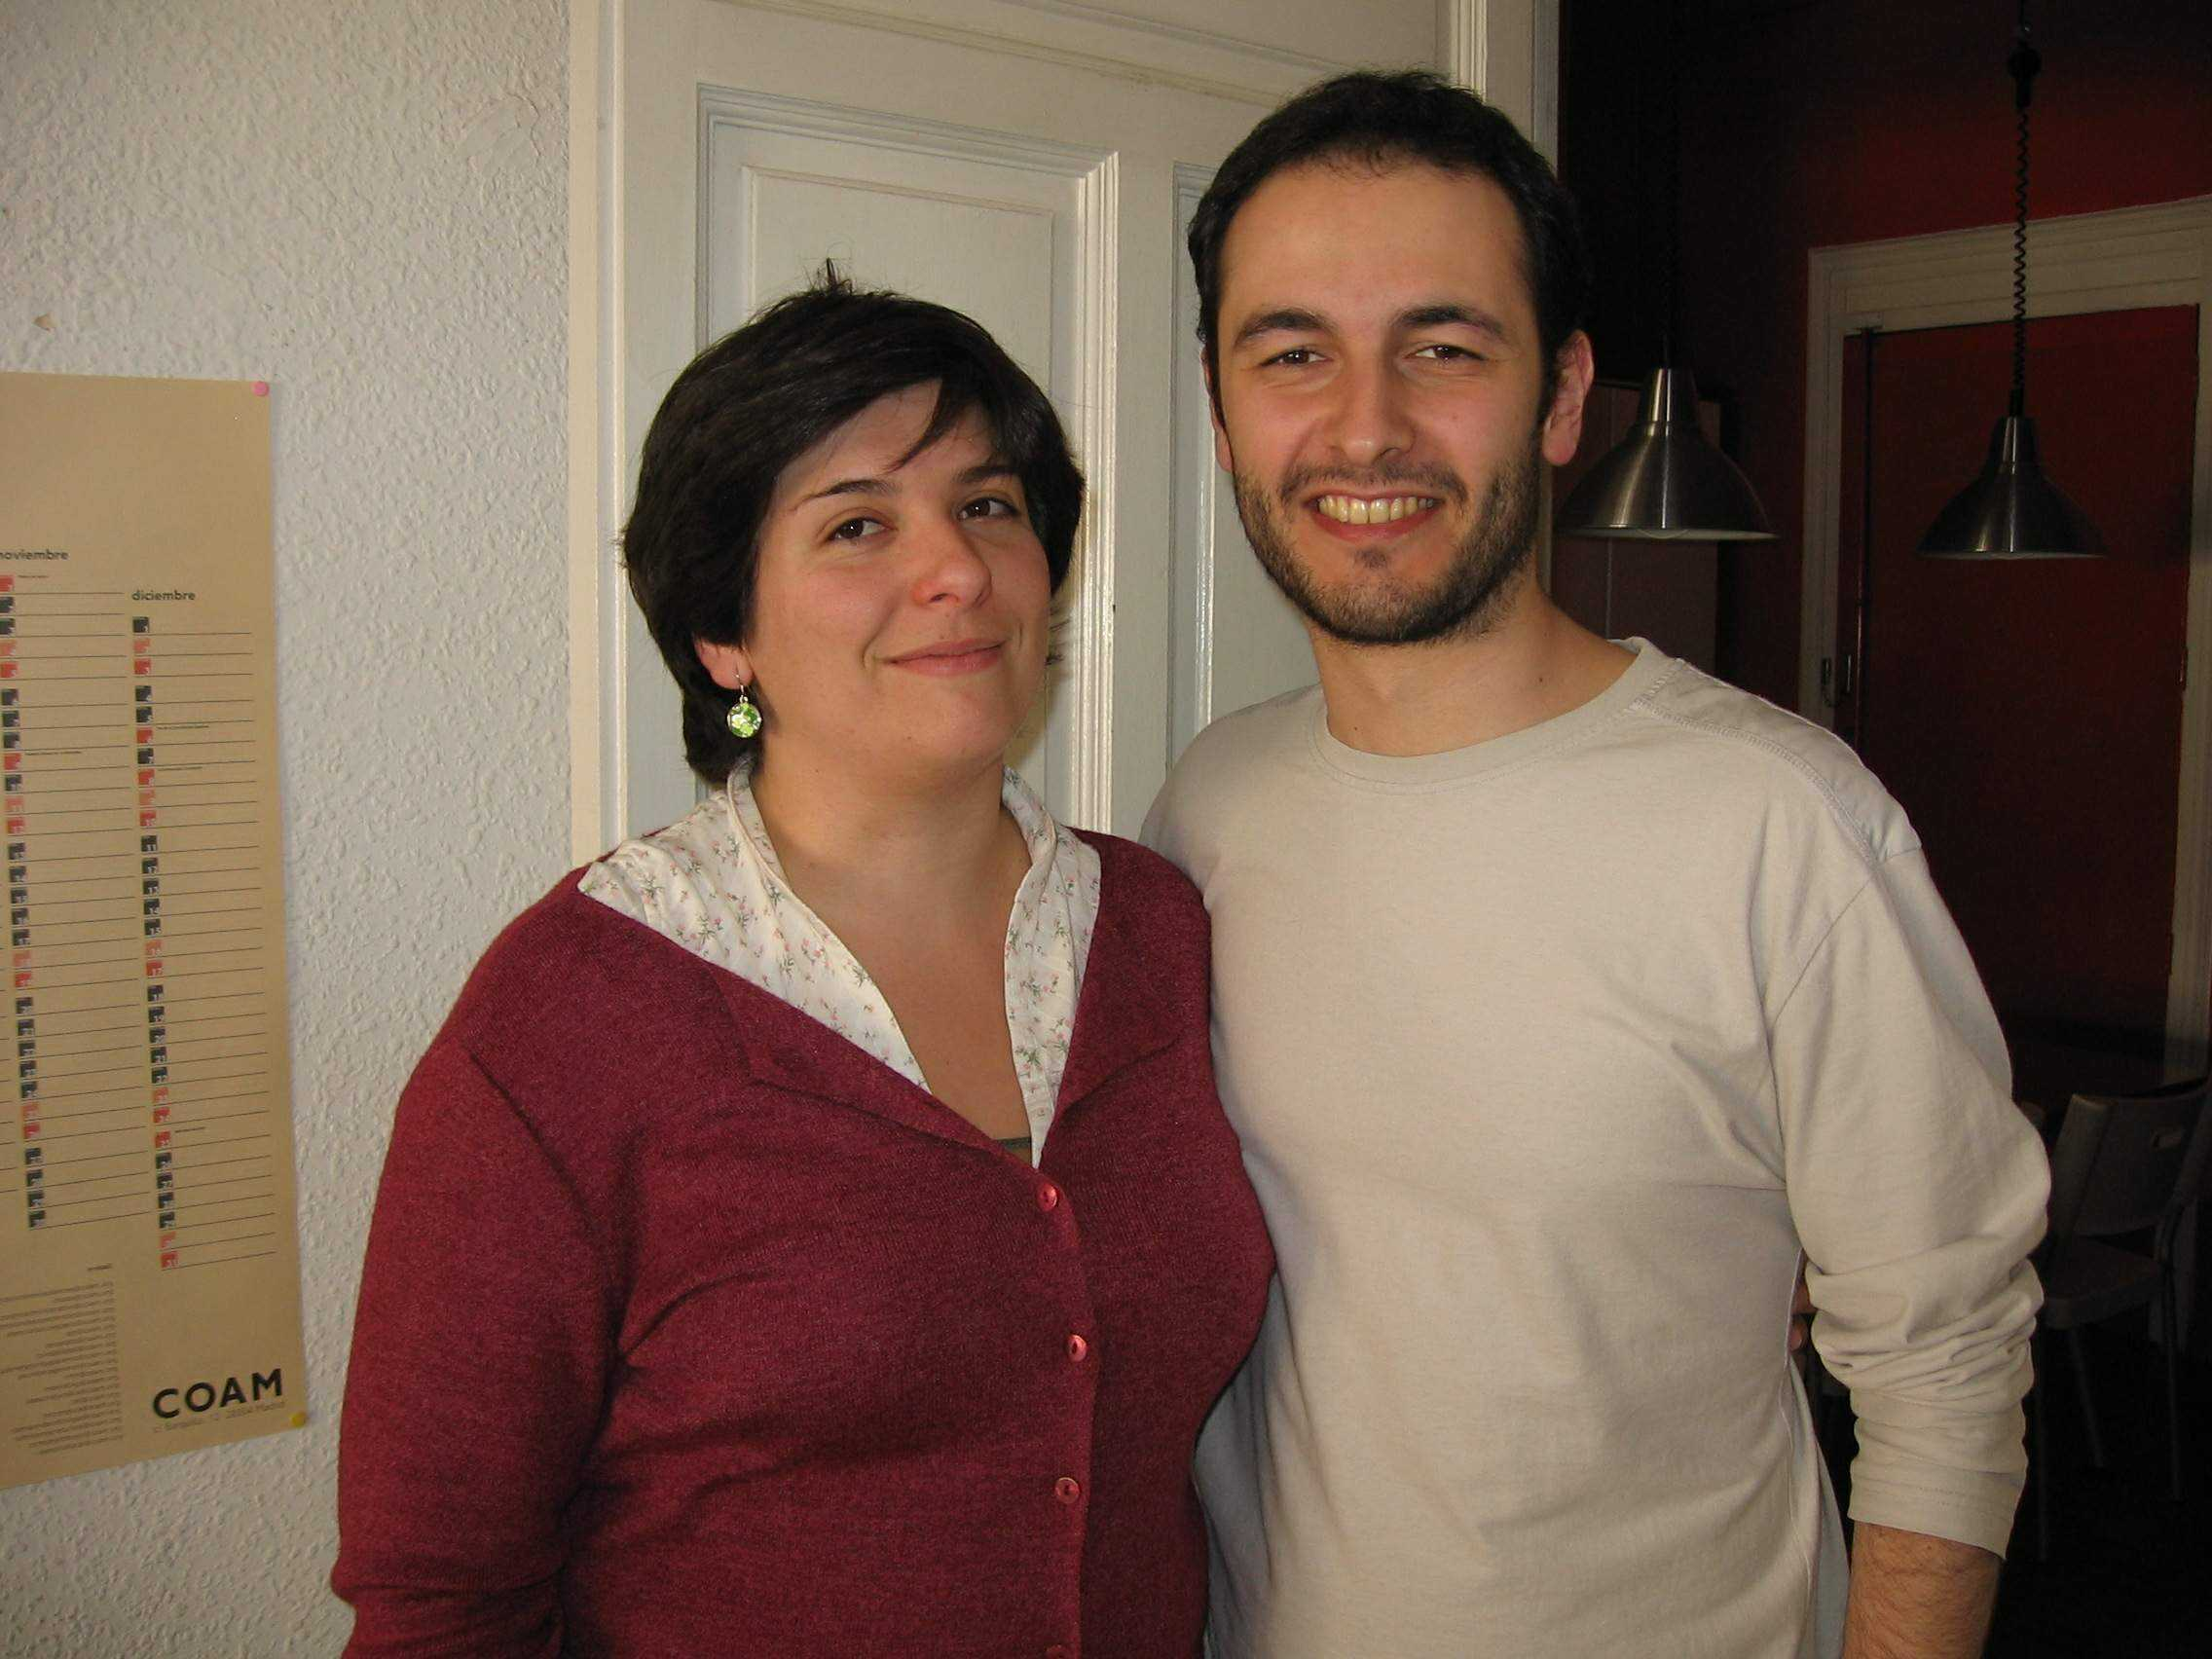 Lola Vivas e Iván Barreira